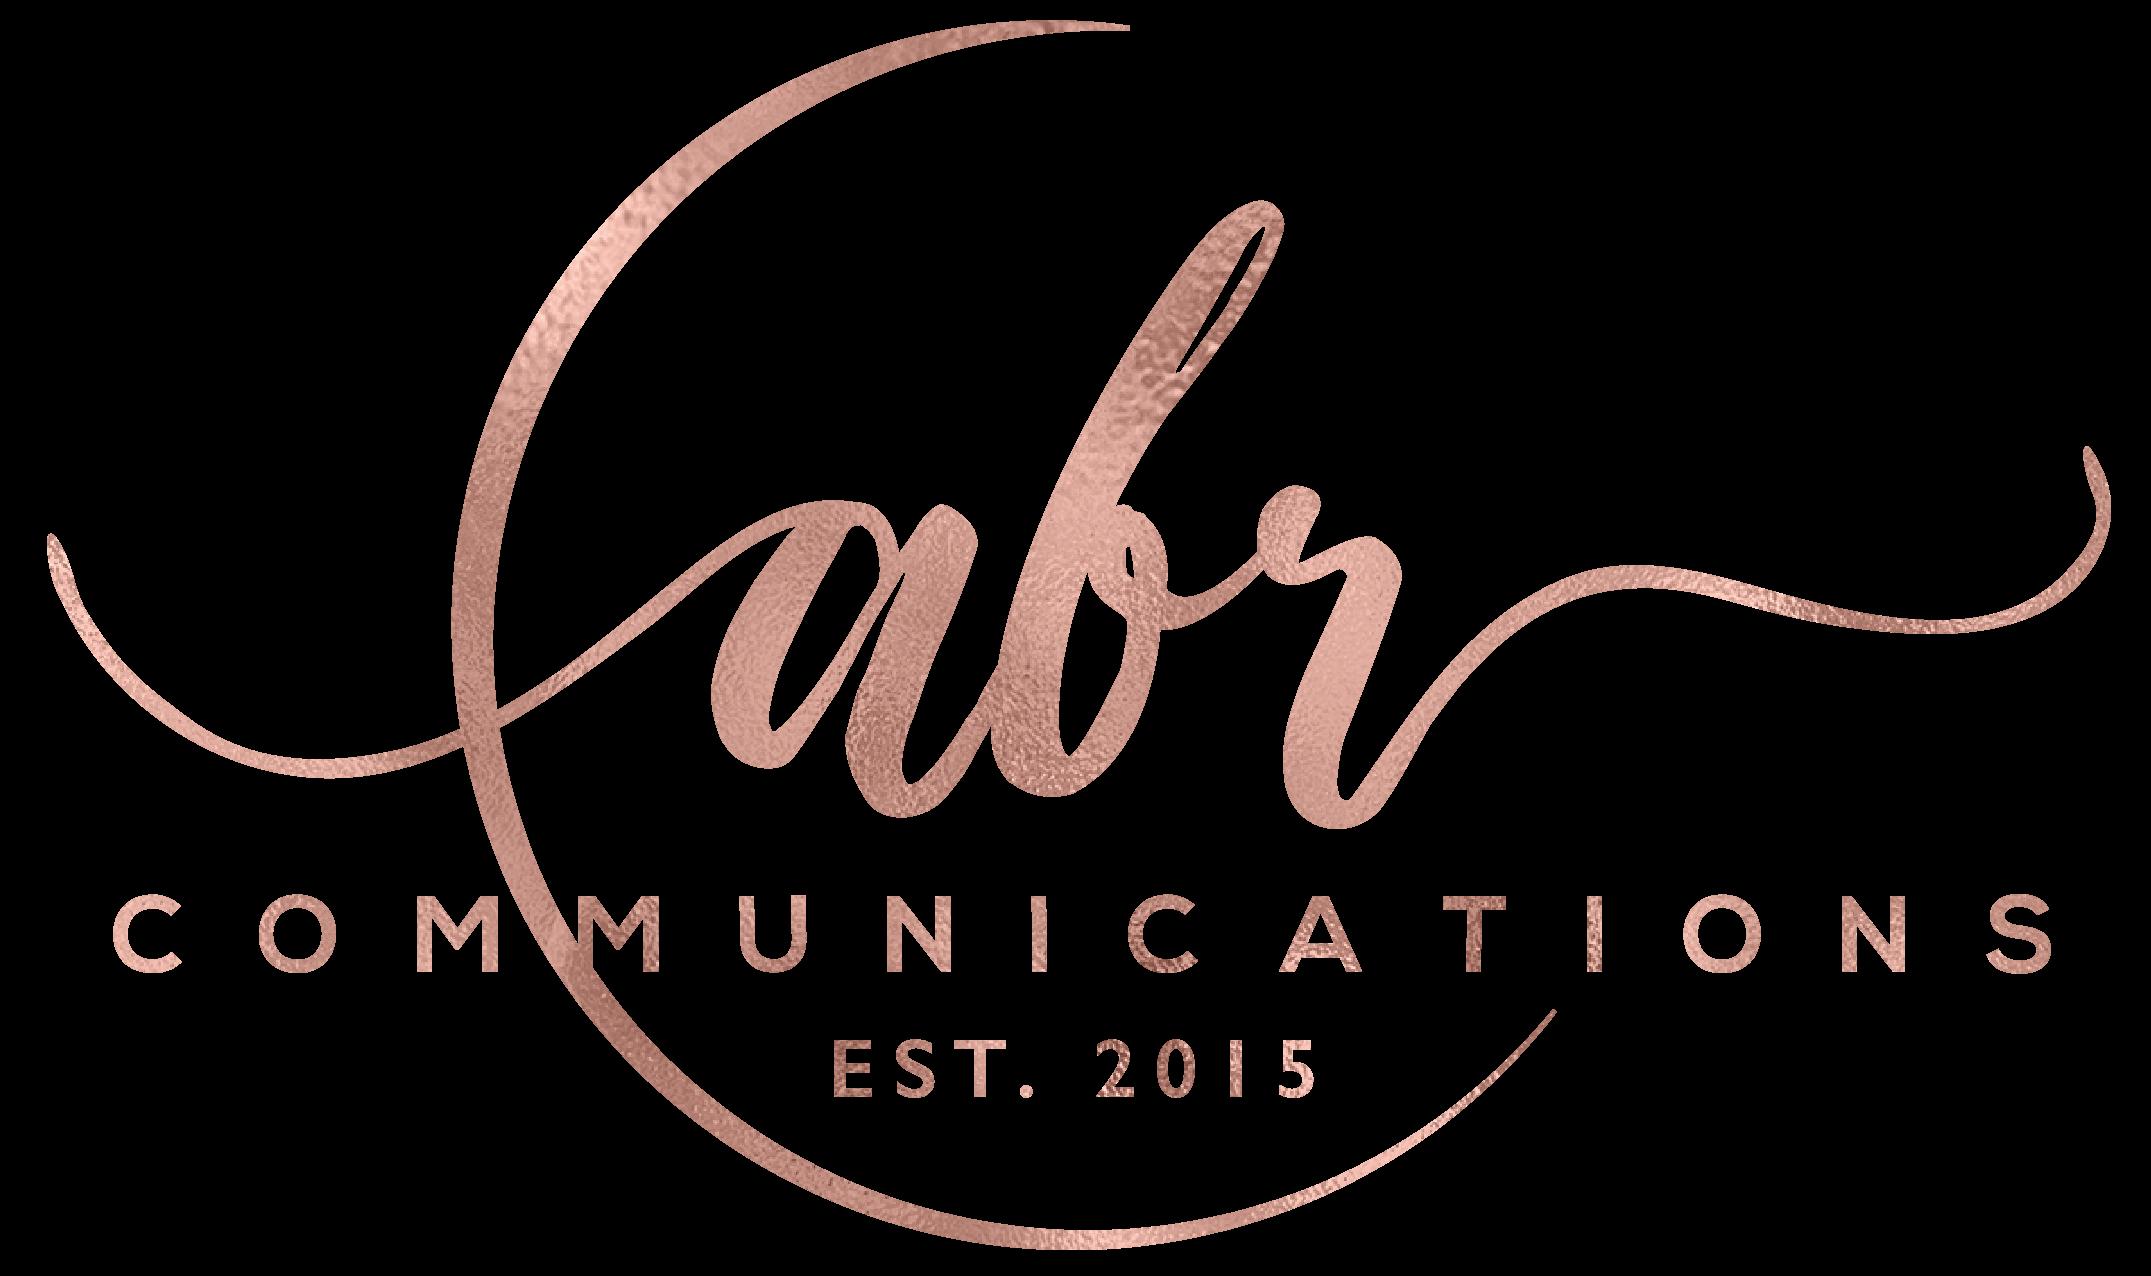 ABR Communications